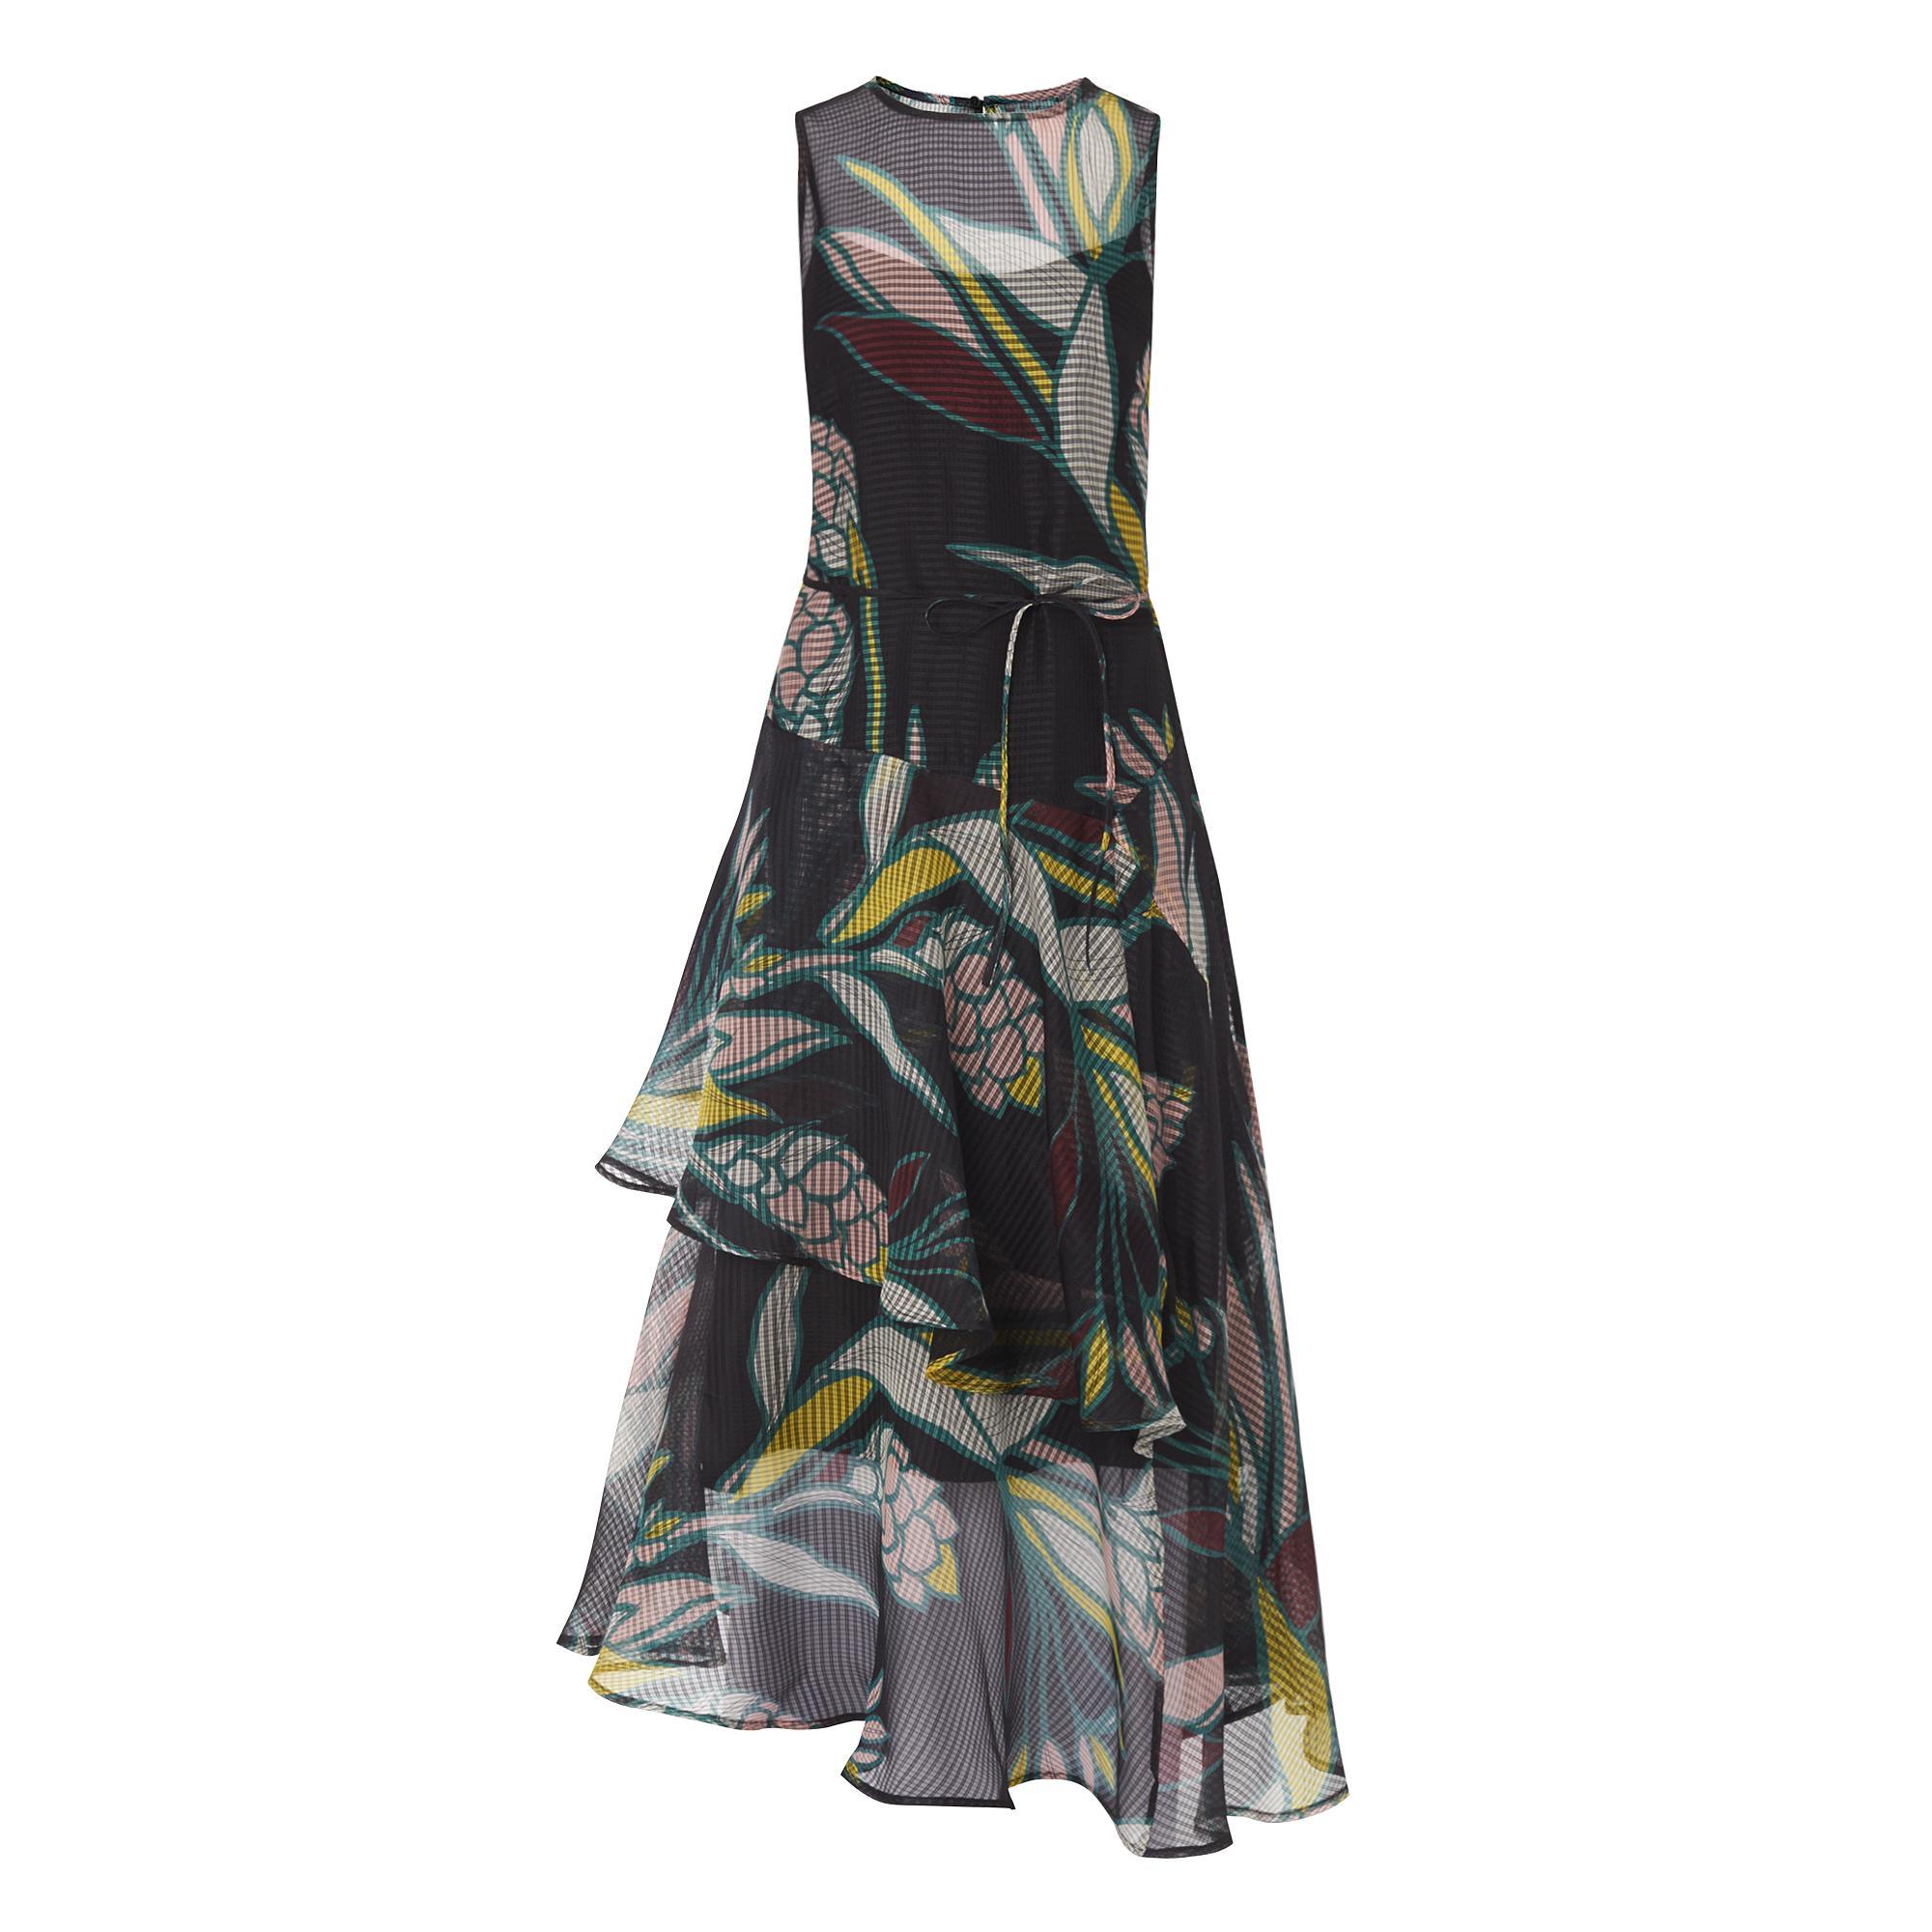 Kalia Dress